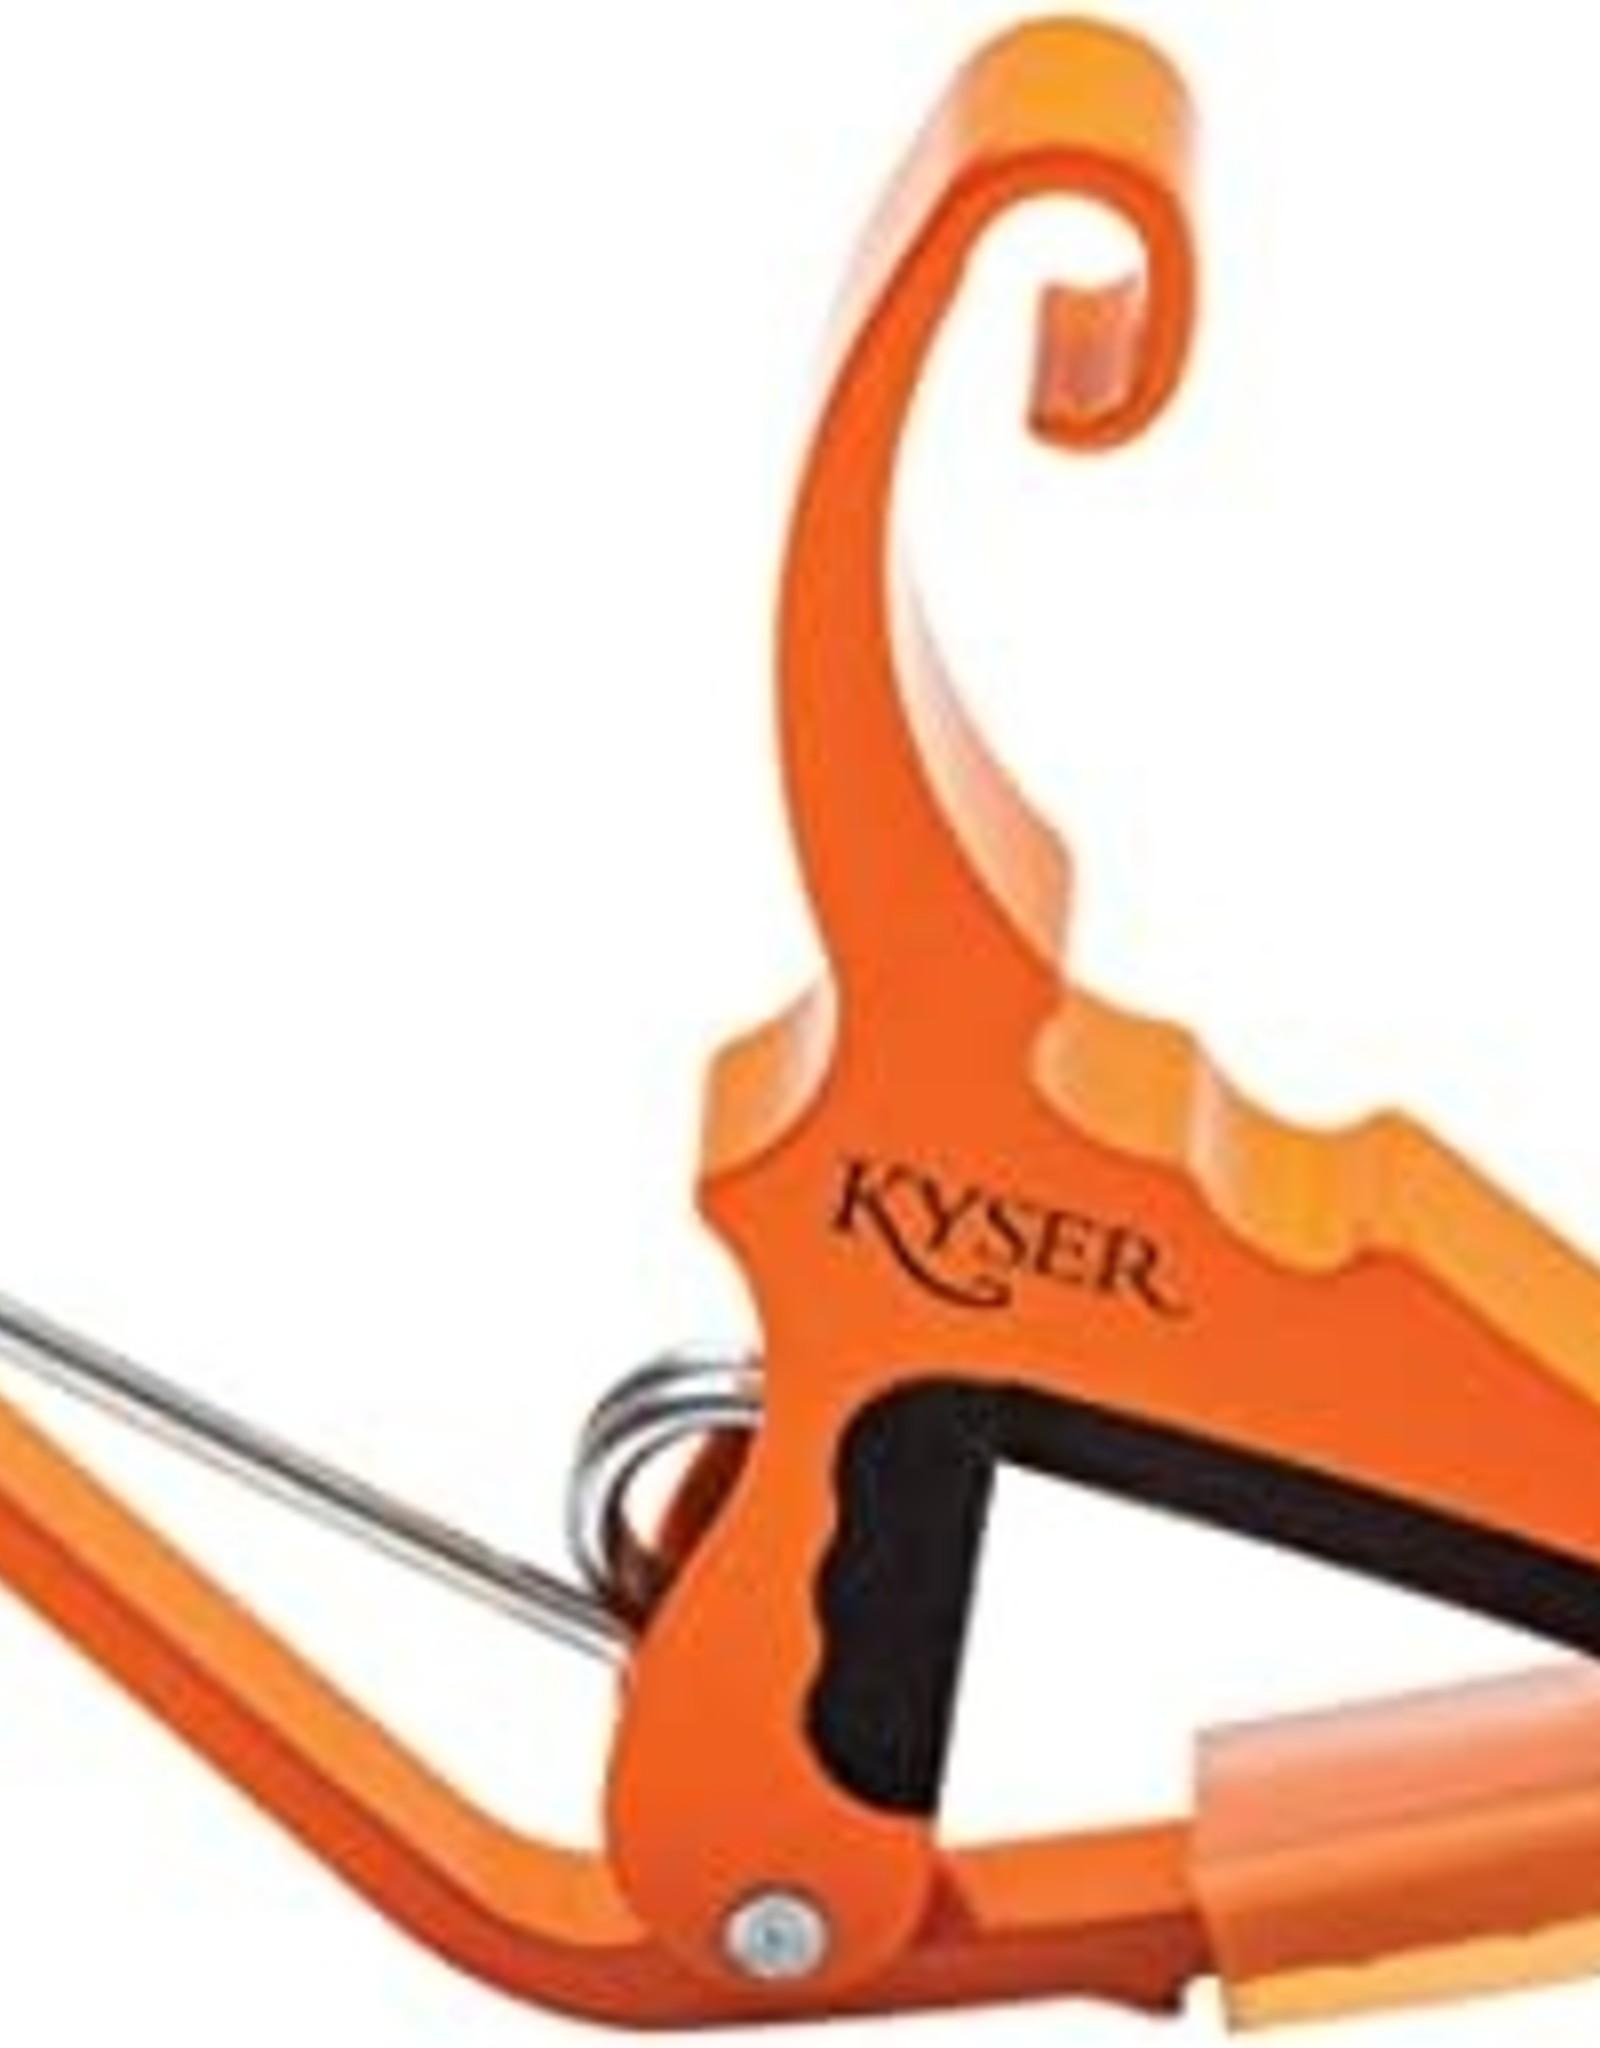 Kyser Kyser Quick-Change Capo